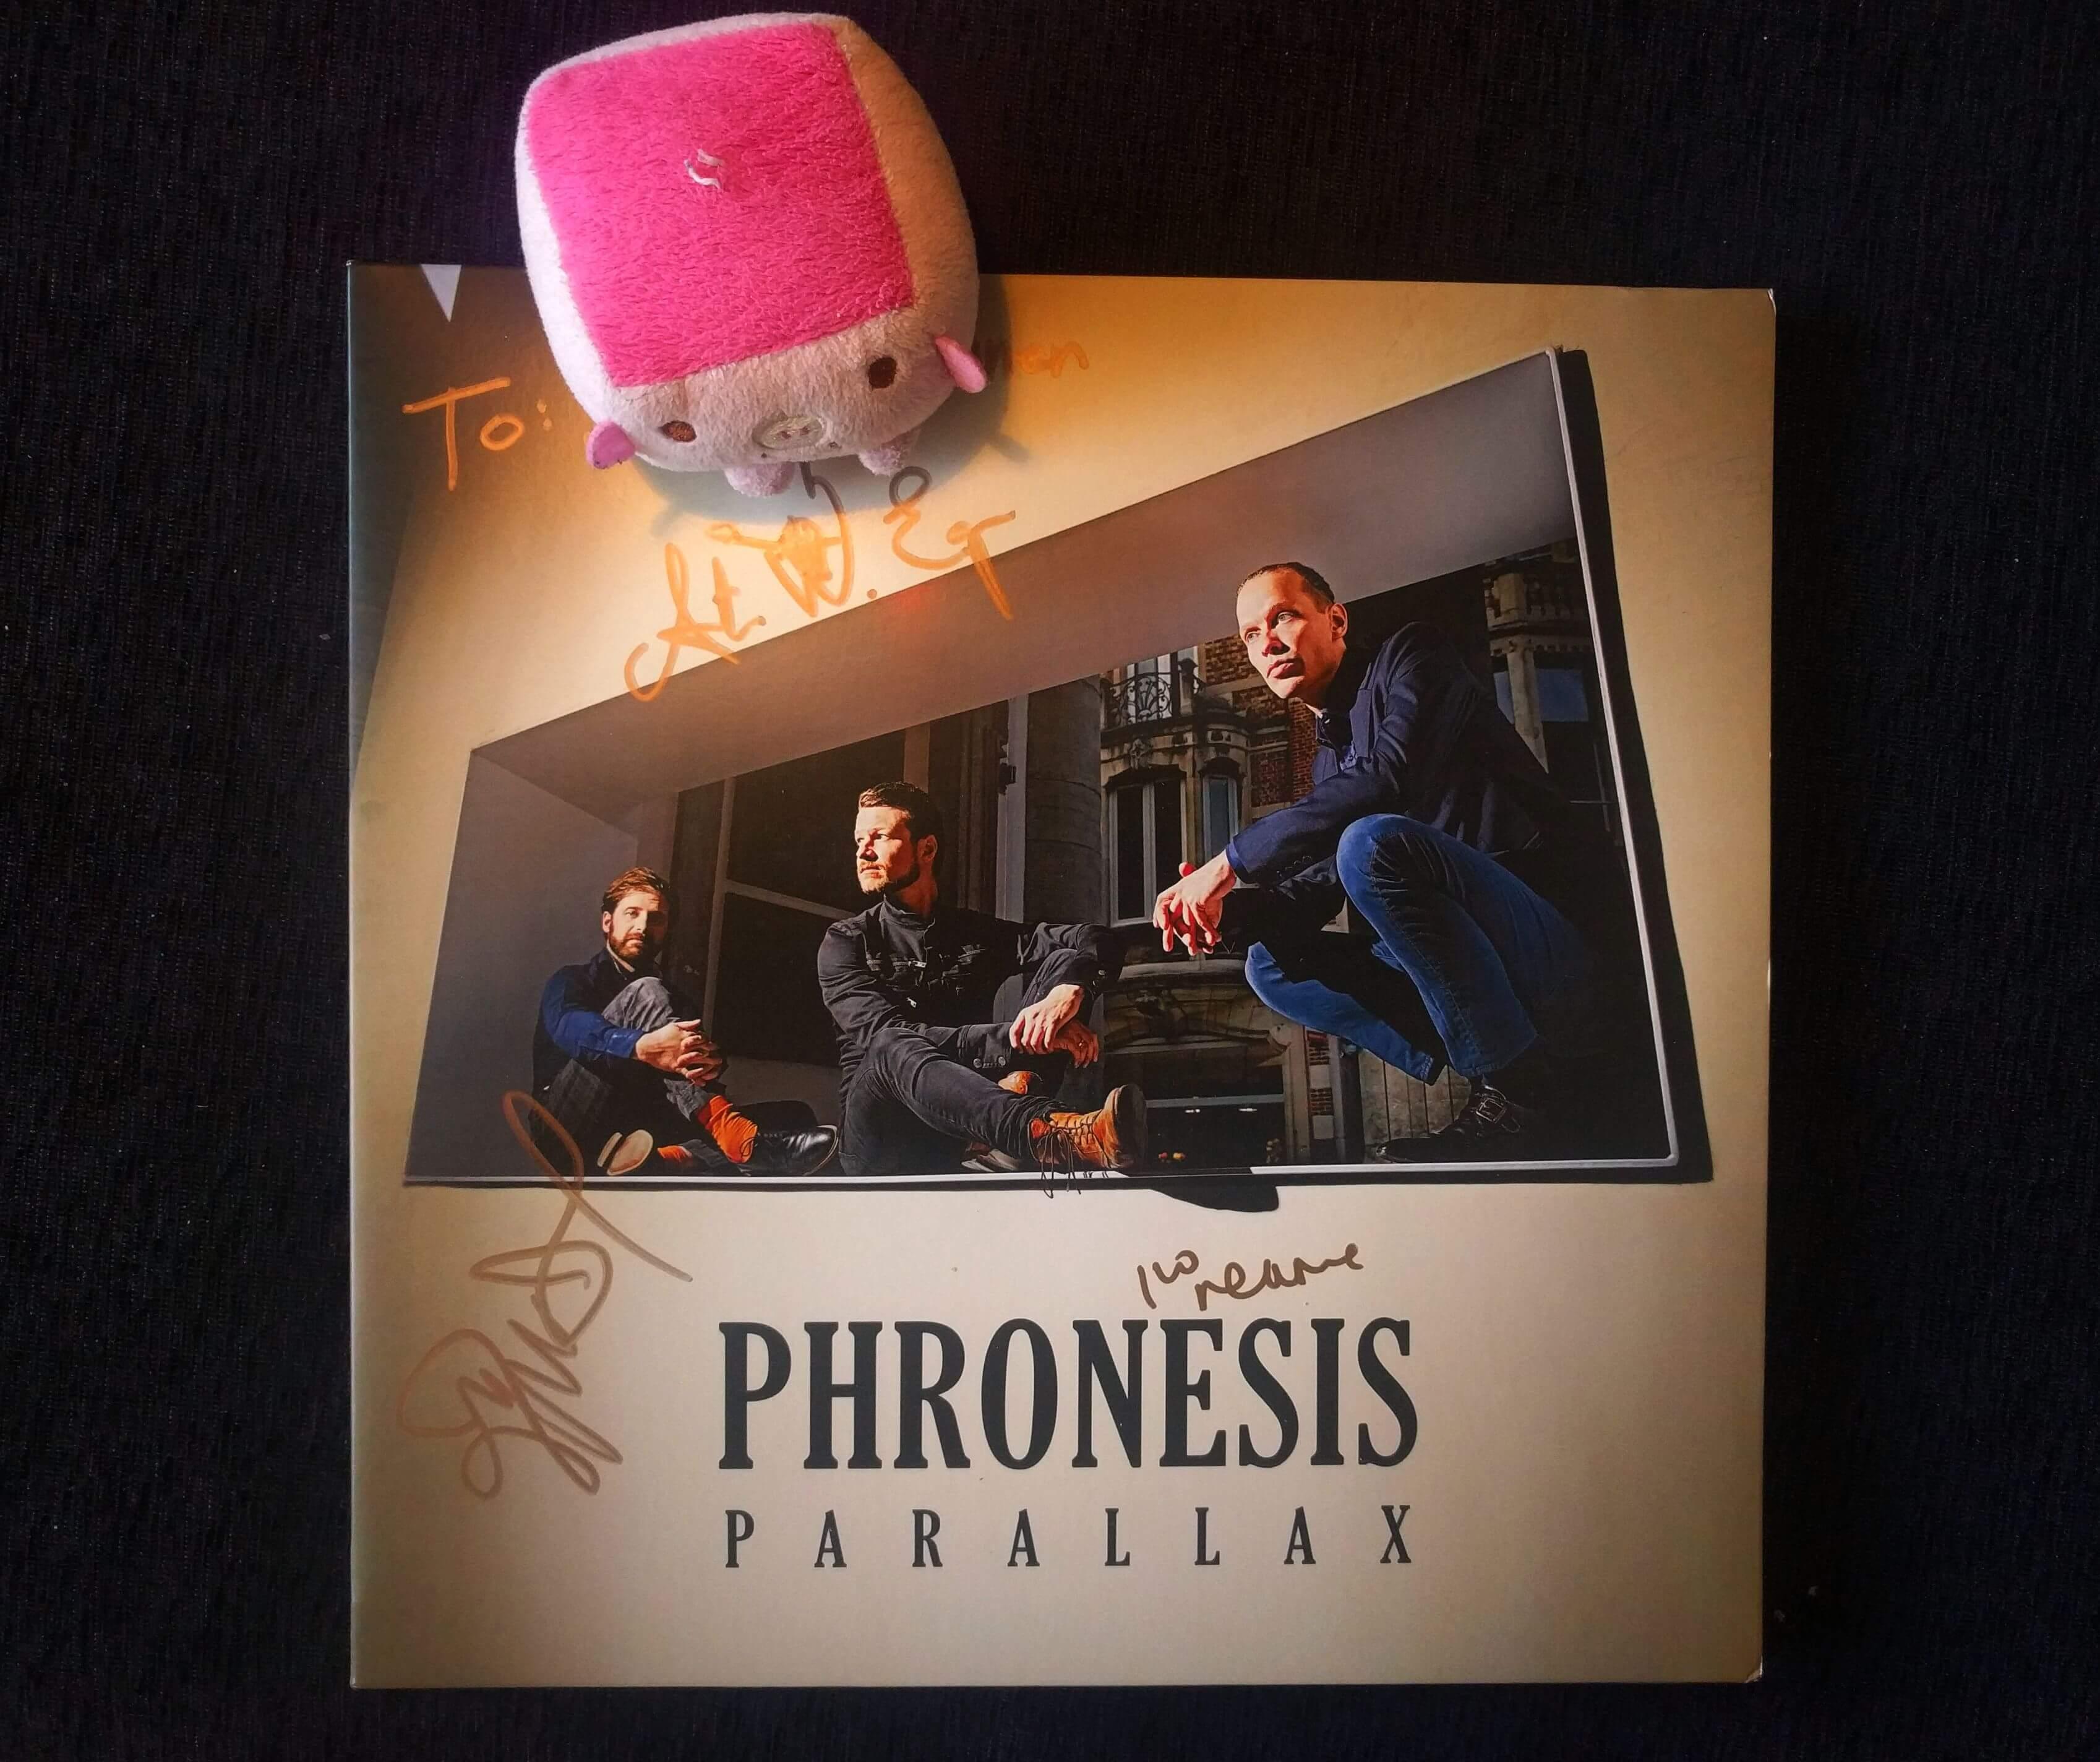 phronesis_parallax